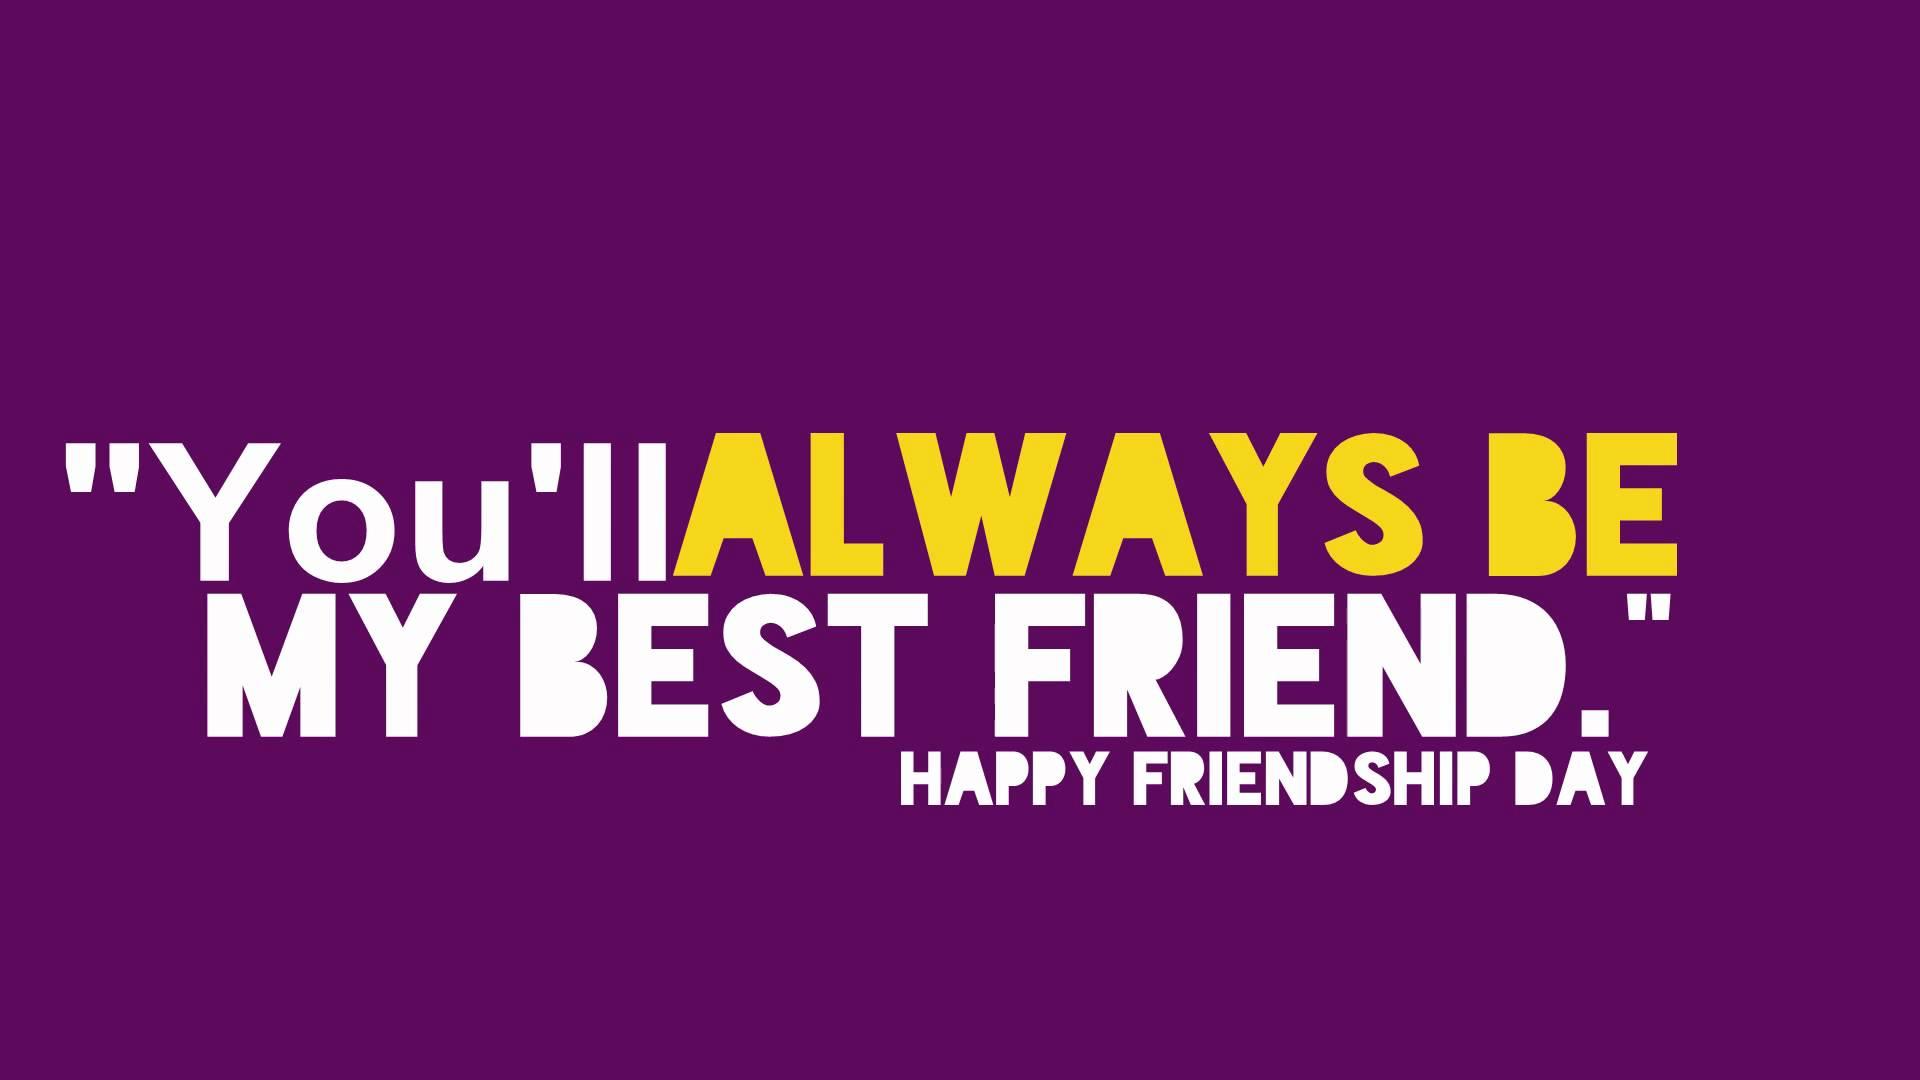 Happy Friendship Day HD Wallpaper